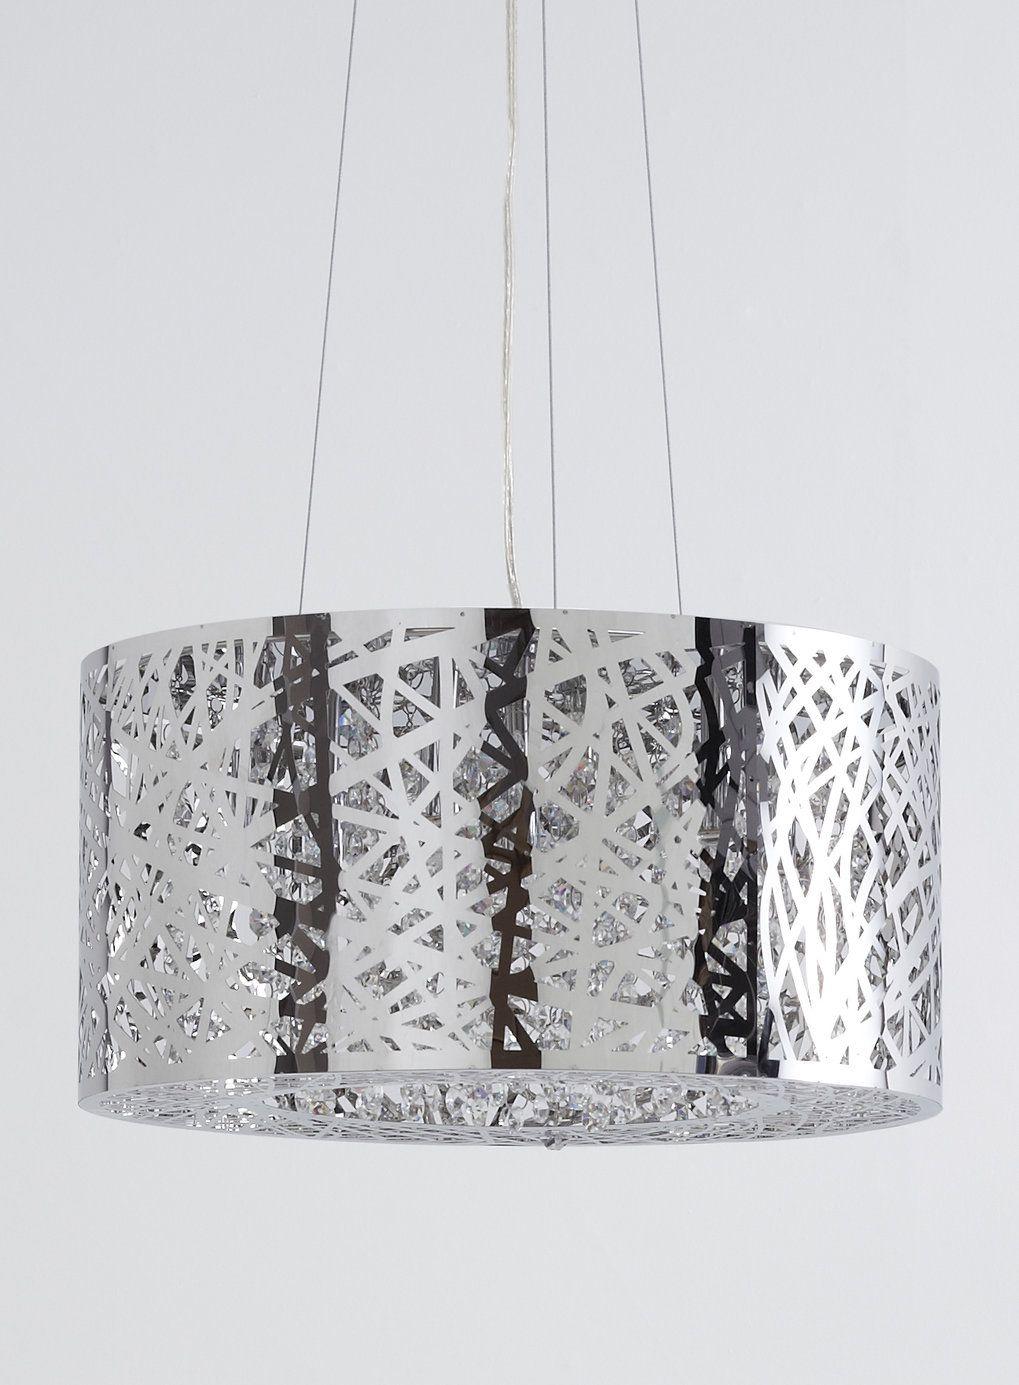 Jena Chandelier Pendant Light - Lighting Event: Up to 50% off - Home ...